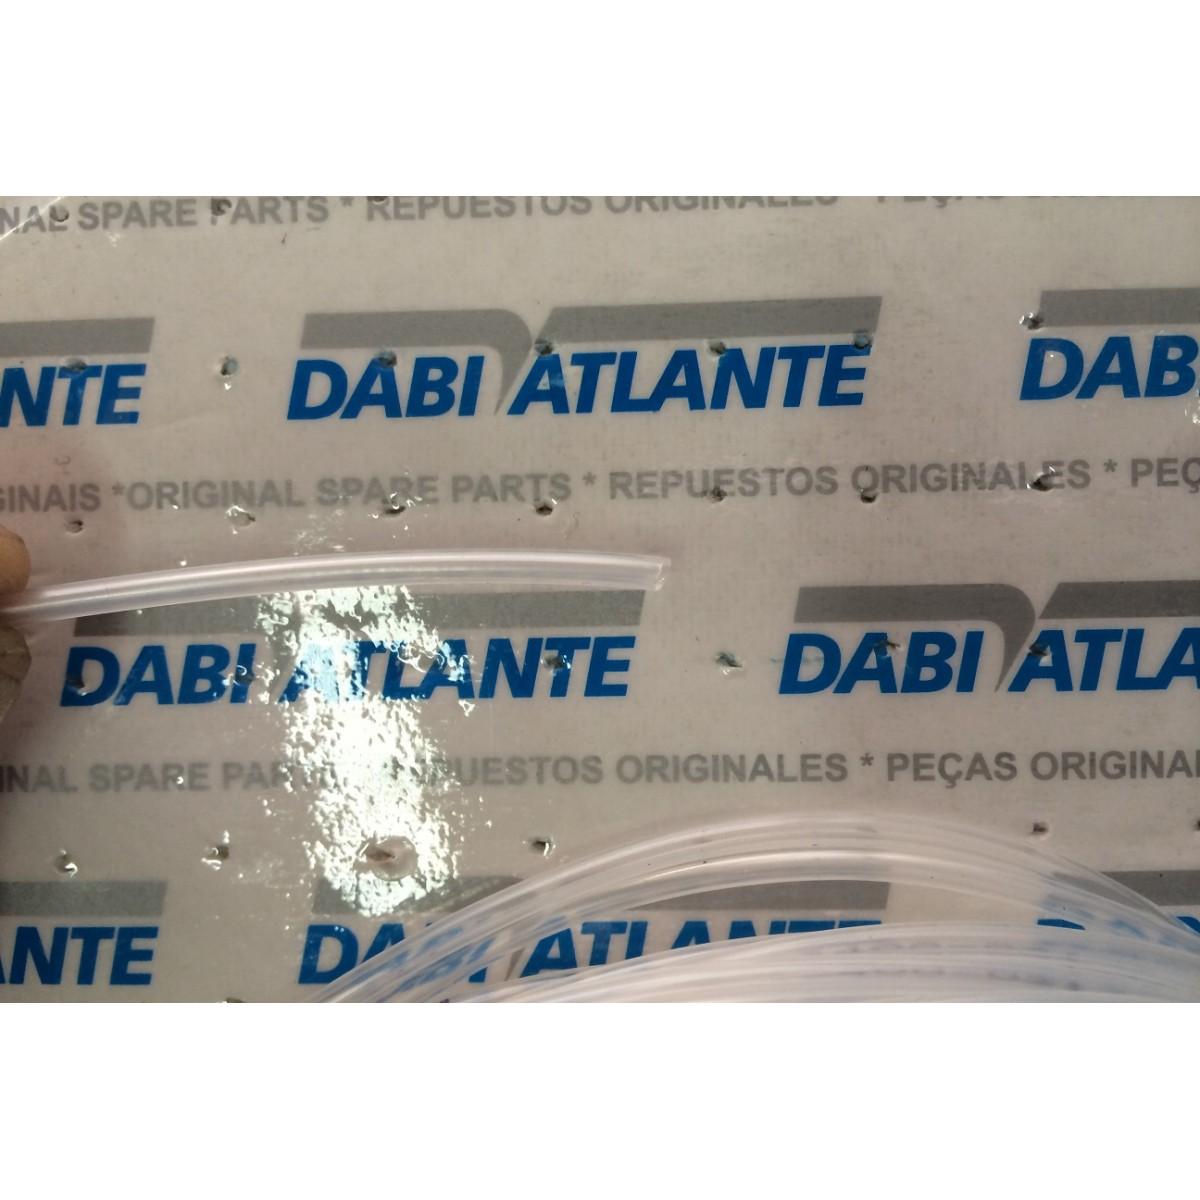 Tubo  PU.Cristal DIAM. 2,4 X 1,2 (mangueira super fina)  (Sob Encomenda)  - DABI ATLANTE - TOP ODONTO